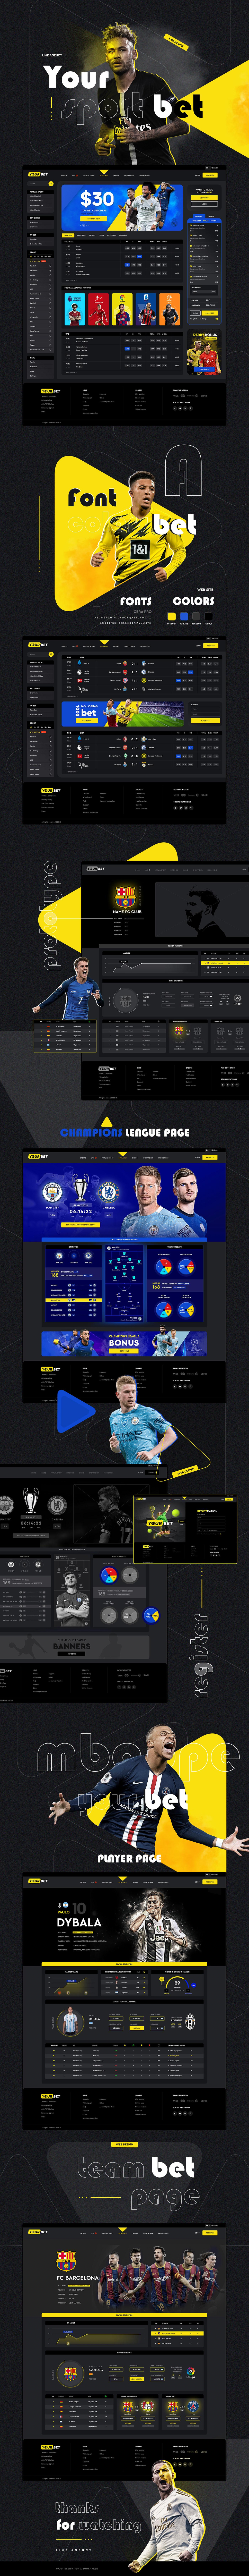 Web design ui ux dashboard game portal Website bet football sport